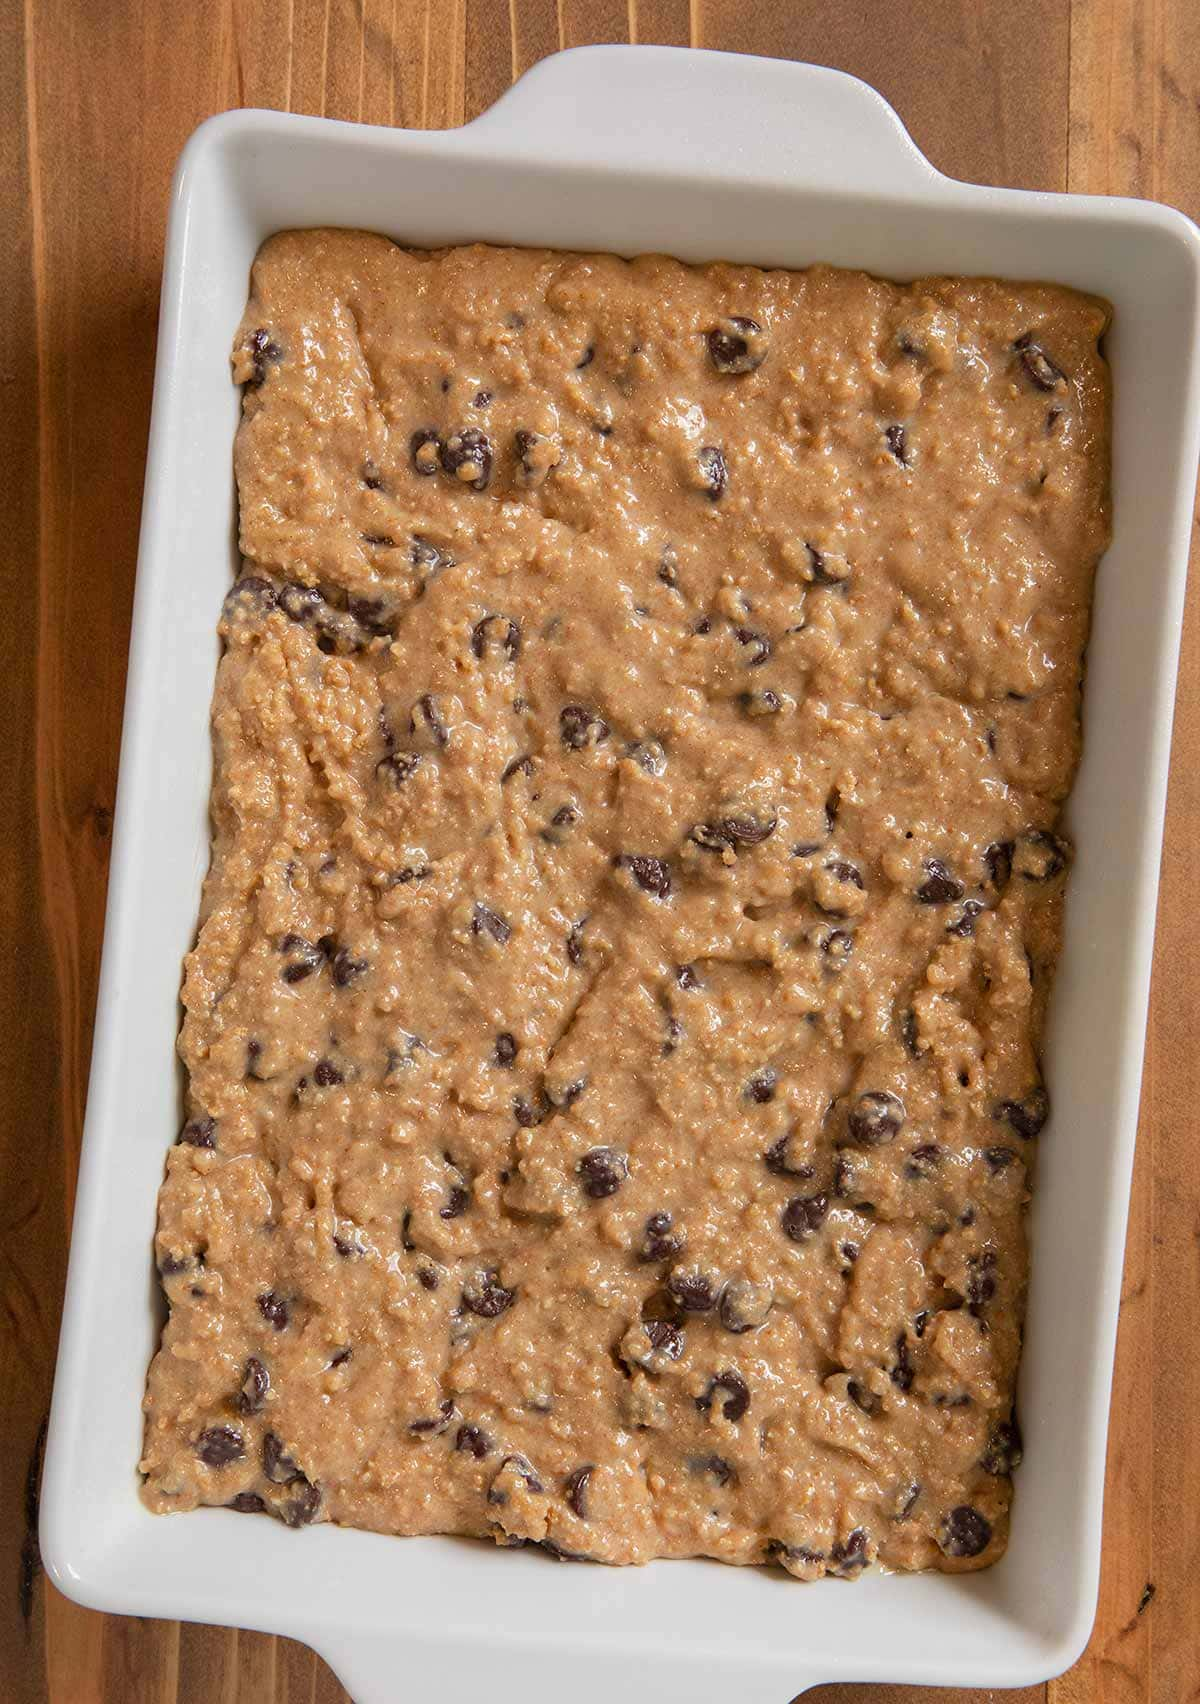 Chewy Graham Cracker Bars in baking dish before baking